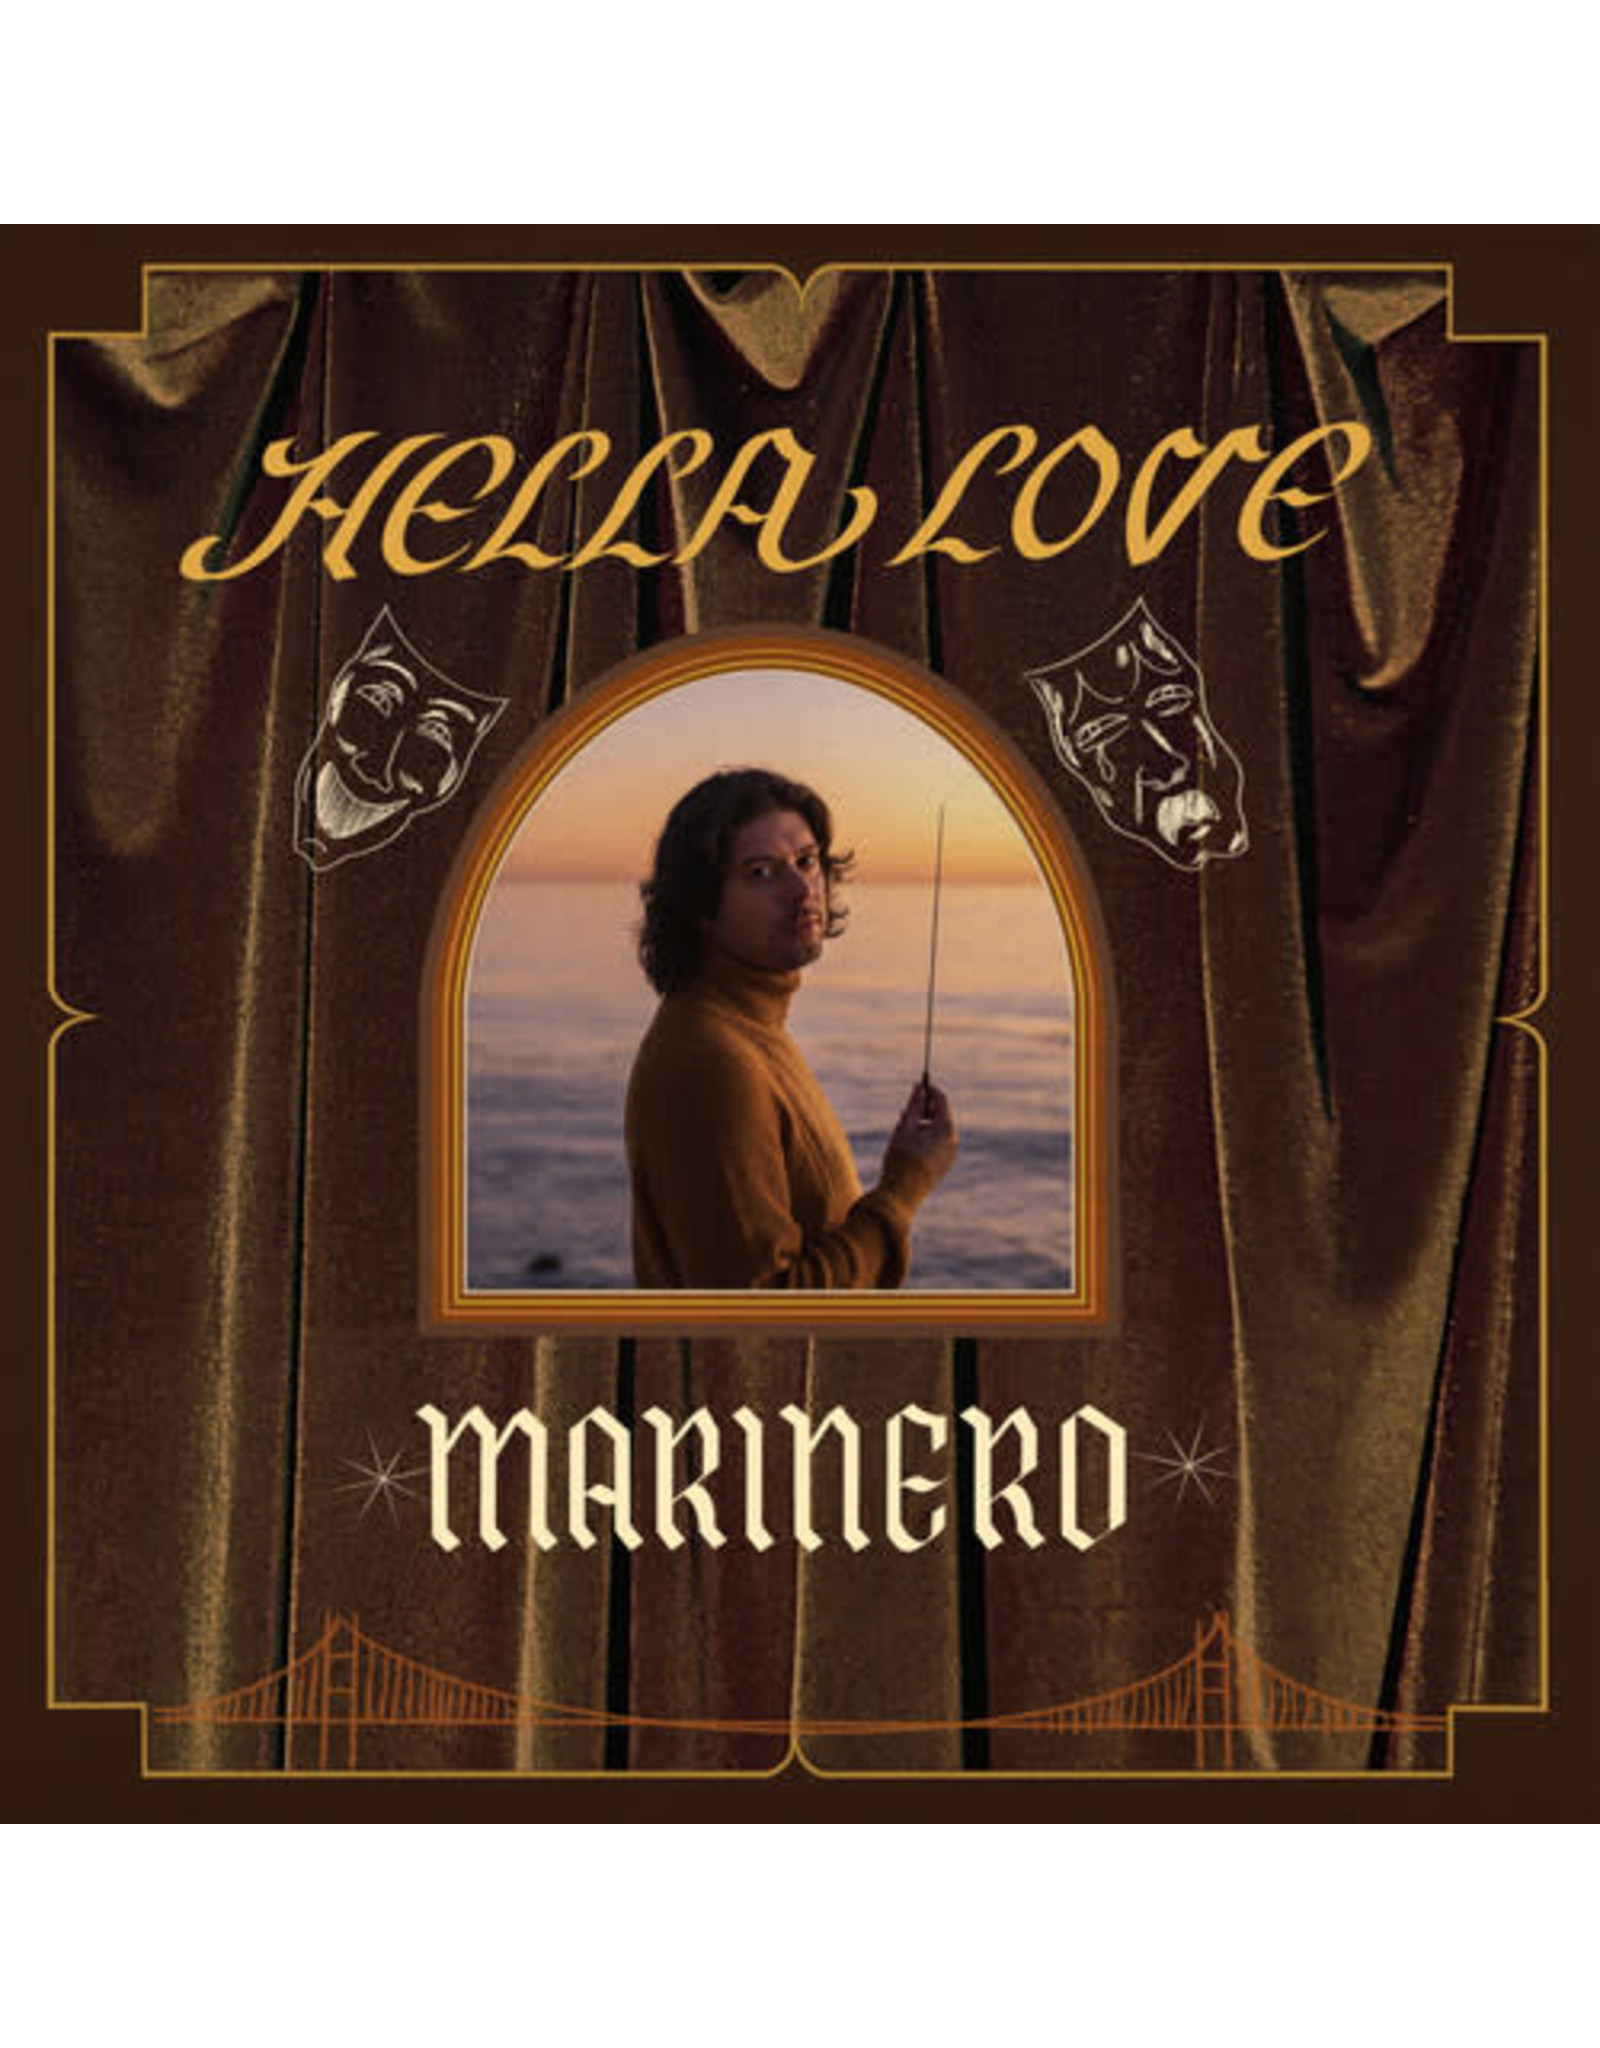 Marinero / Hella Love (Orange Vinyl)